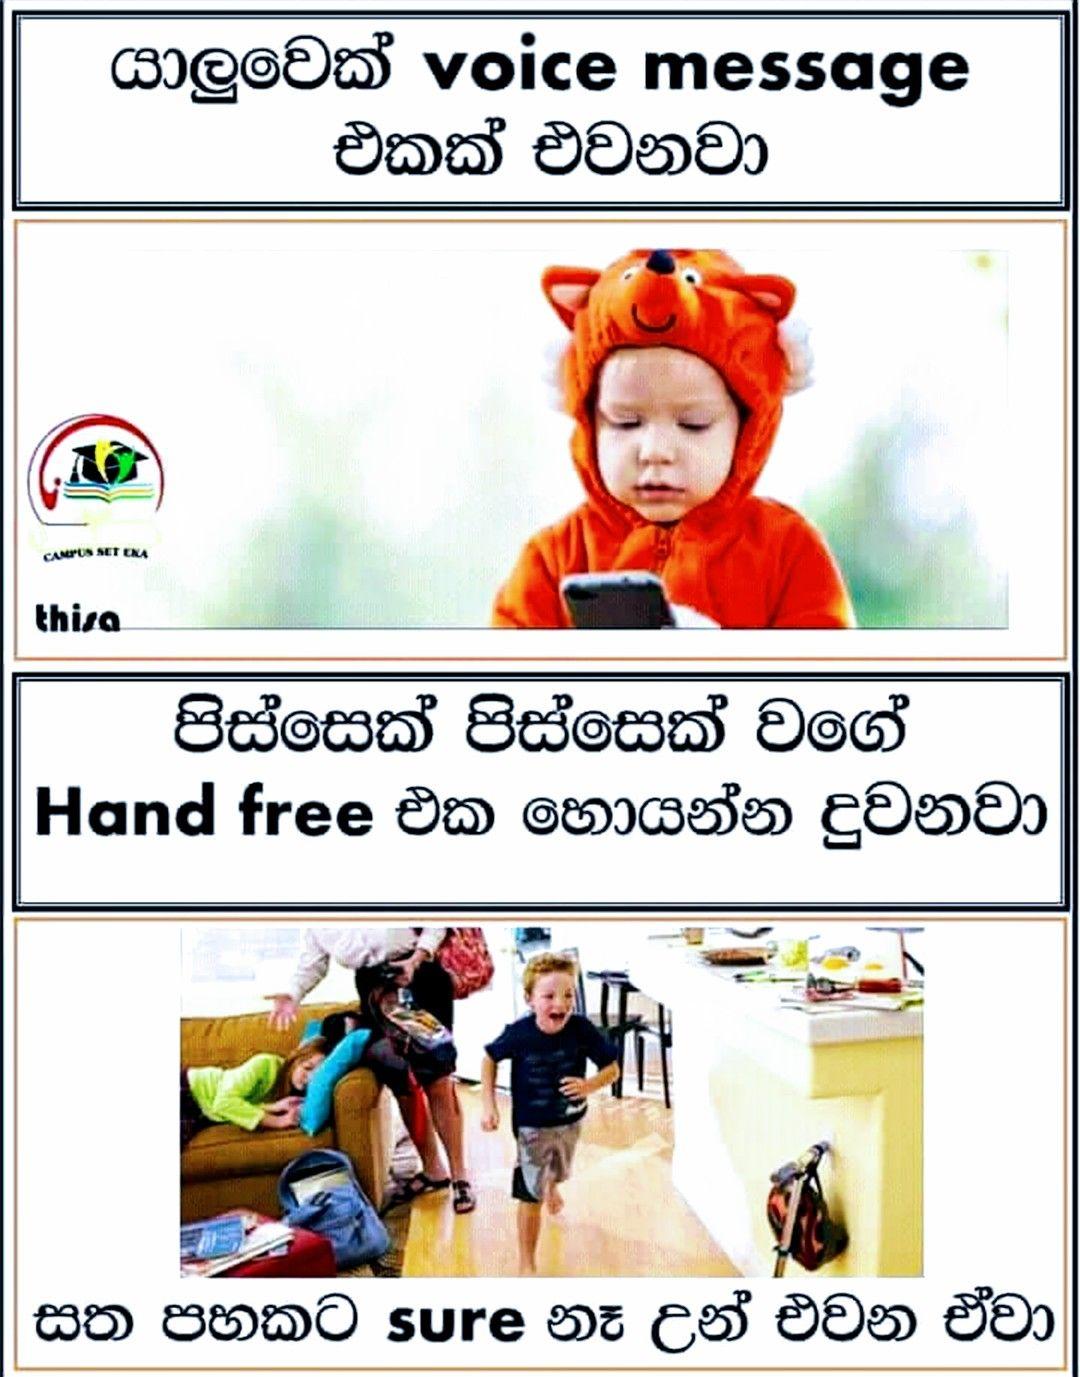 Pin By Binuthi Dissanayake On Lankan Memes Jokes Photos Jokes Quotes Funny Pictures